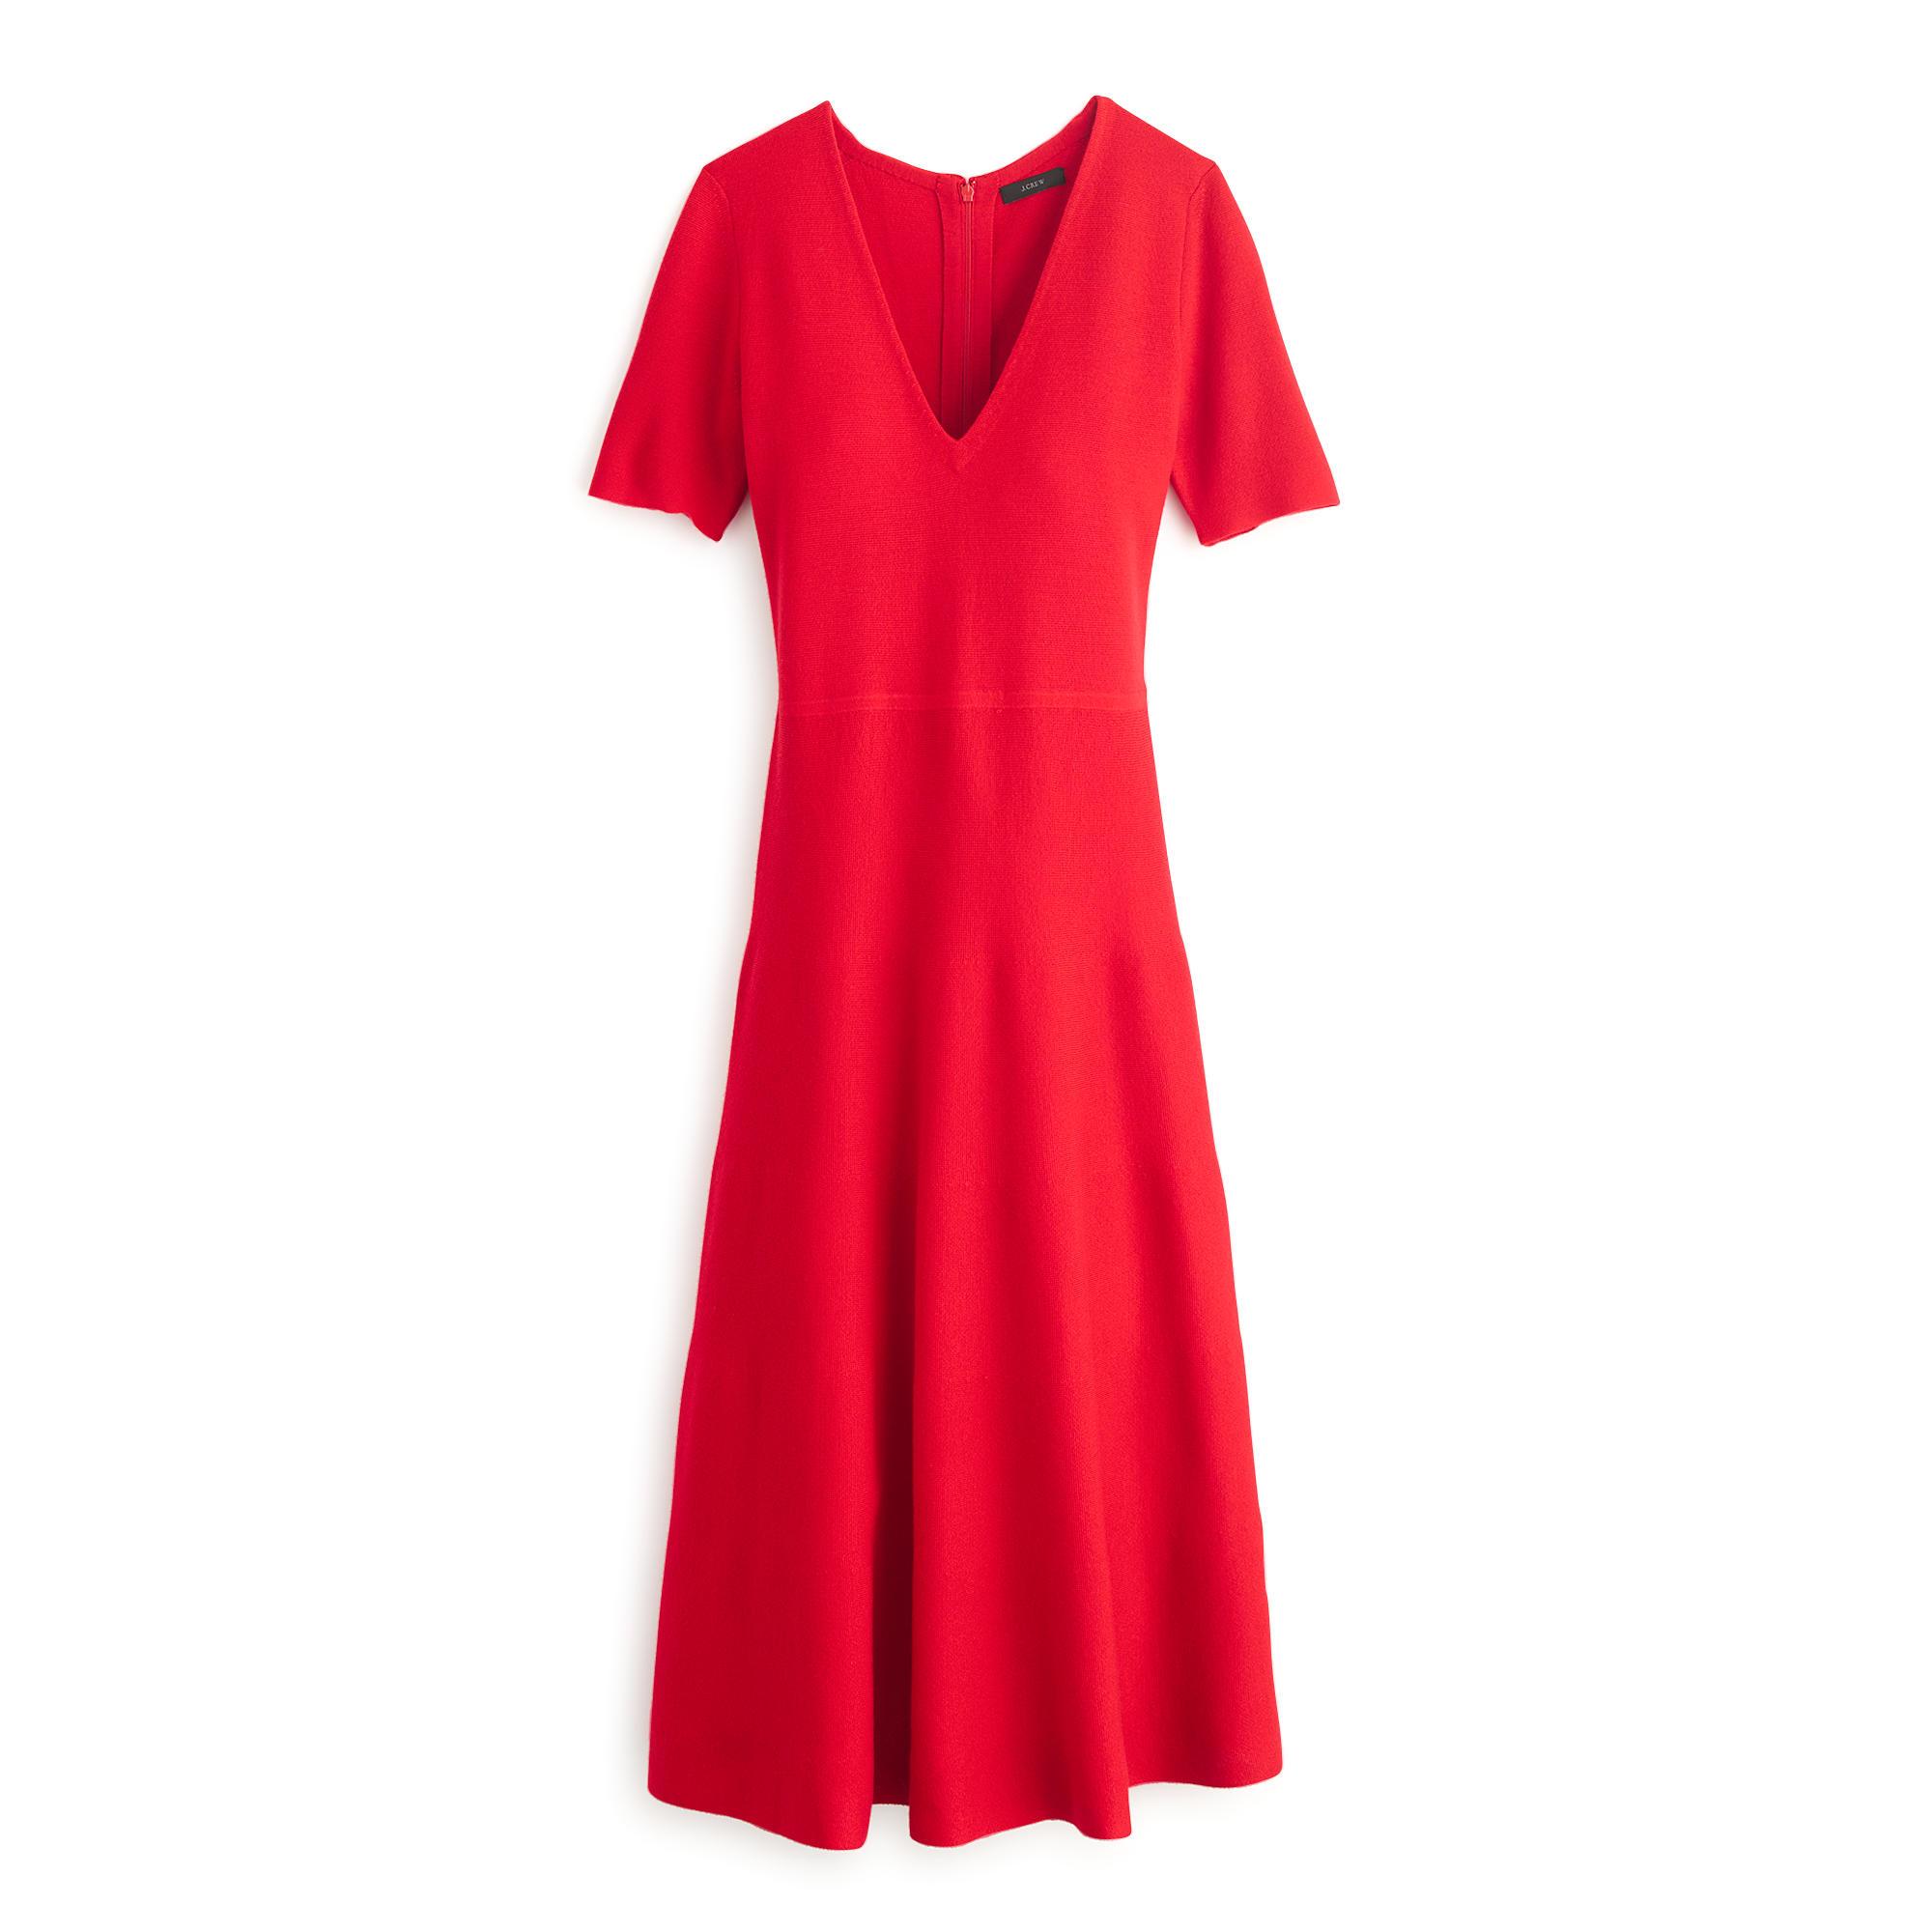 3552dae9a32 Lyst - J.Crew Merino Sweater-dress in Red